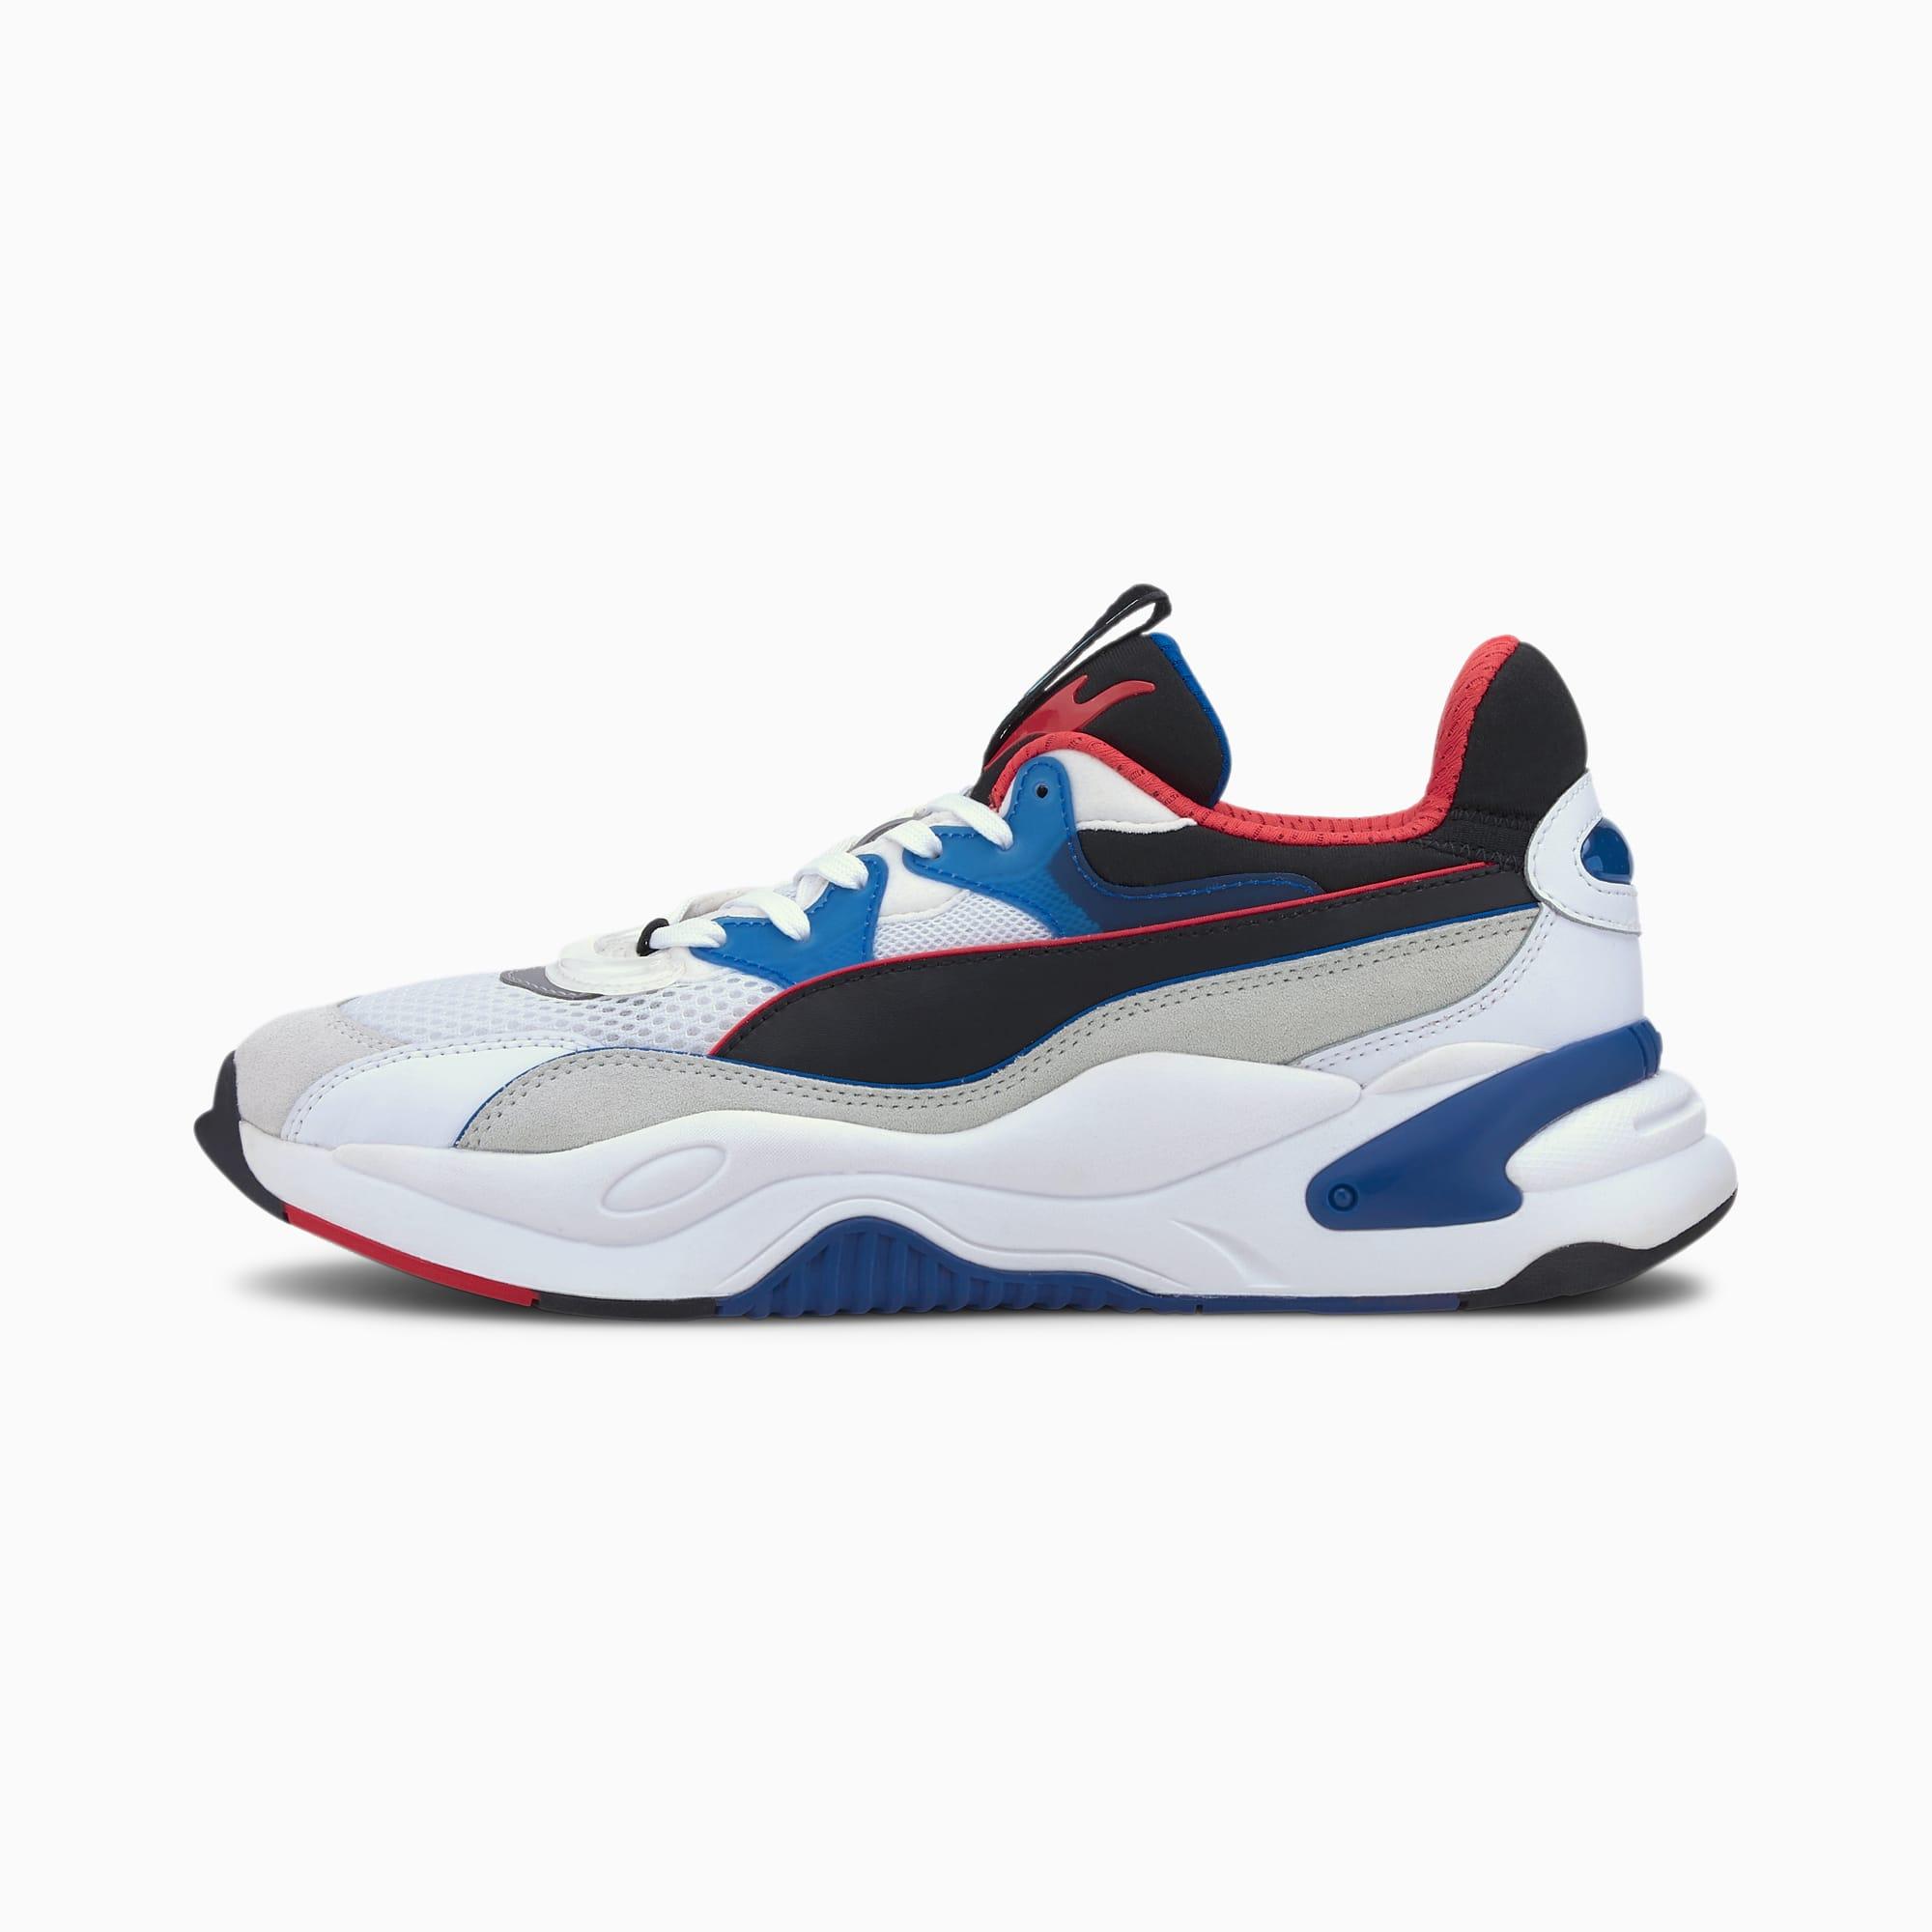 PUMA Chaussure Basket RS-2K Internet Exploring, Blanc/Bleu, Taille 39, Chaussures